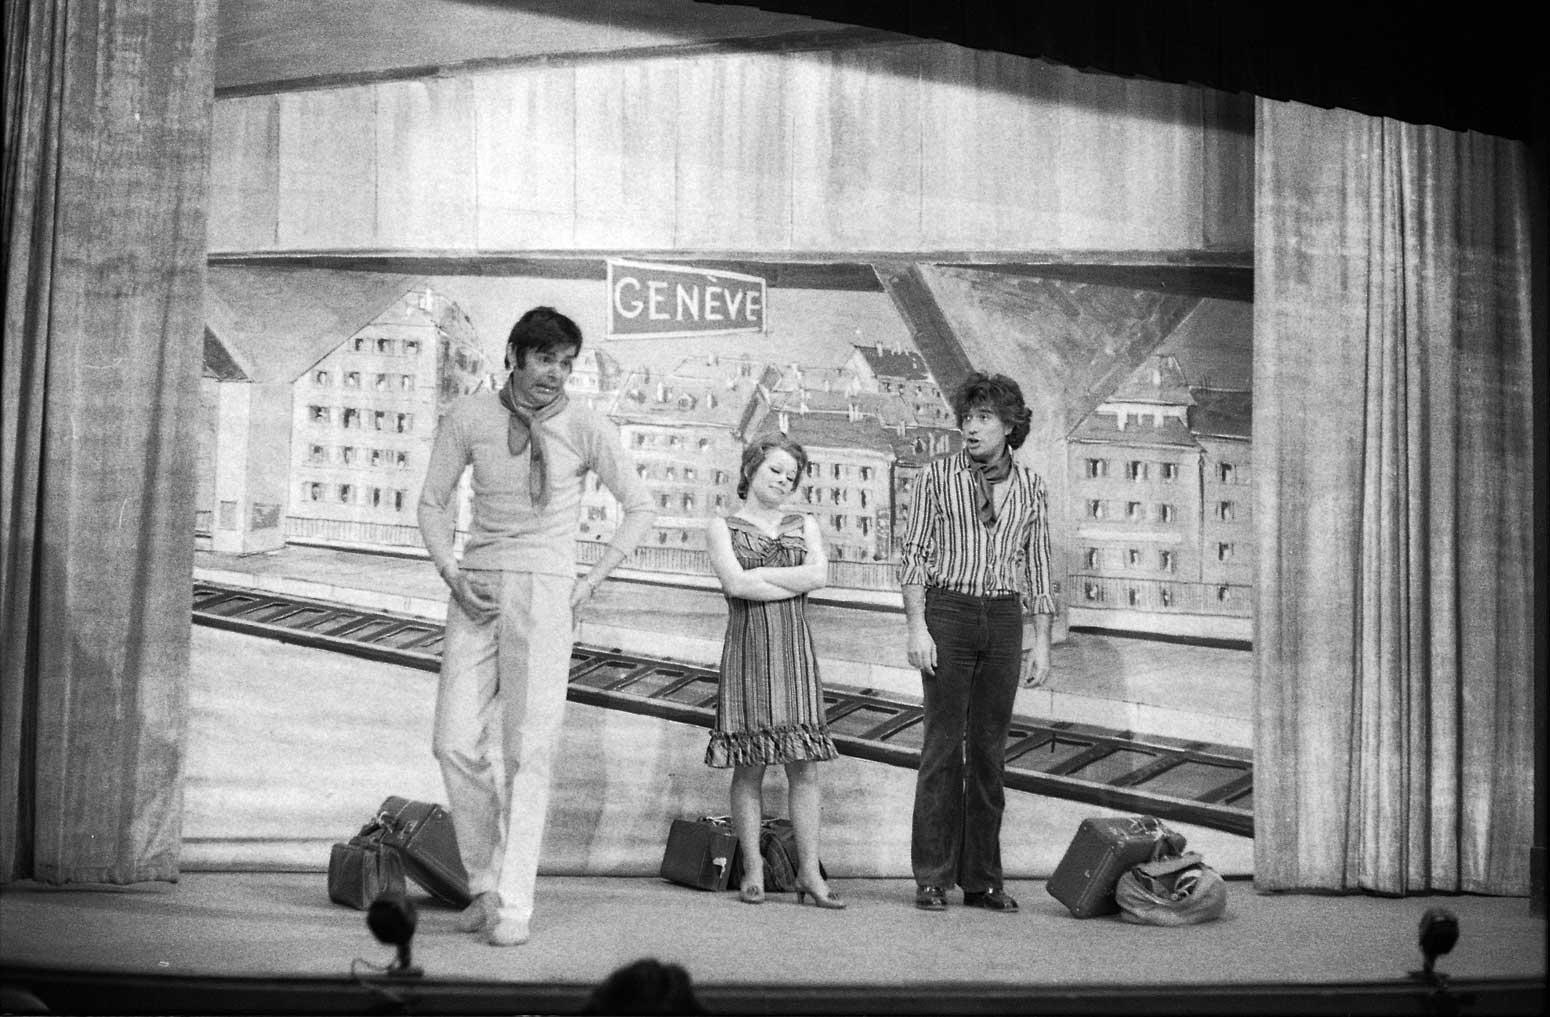 Revue 1971 ©Centre d'iconographie genevoise